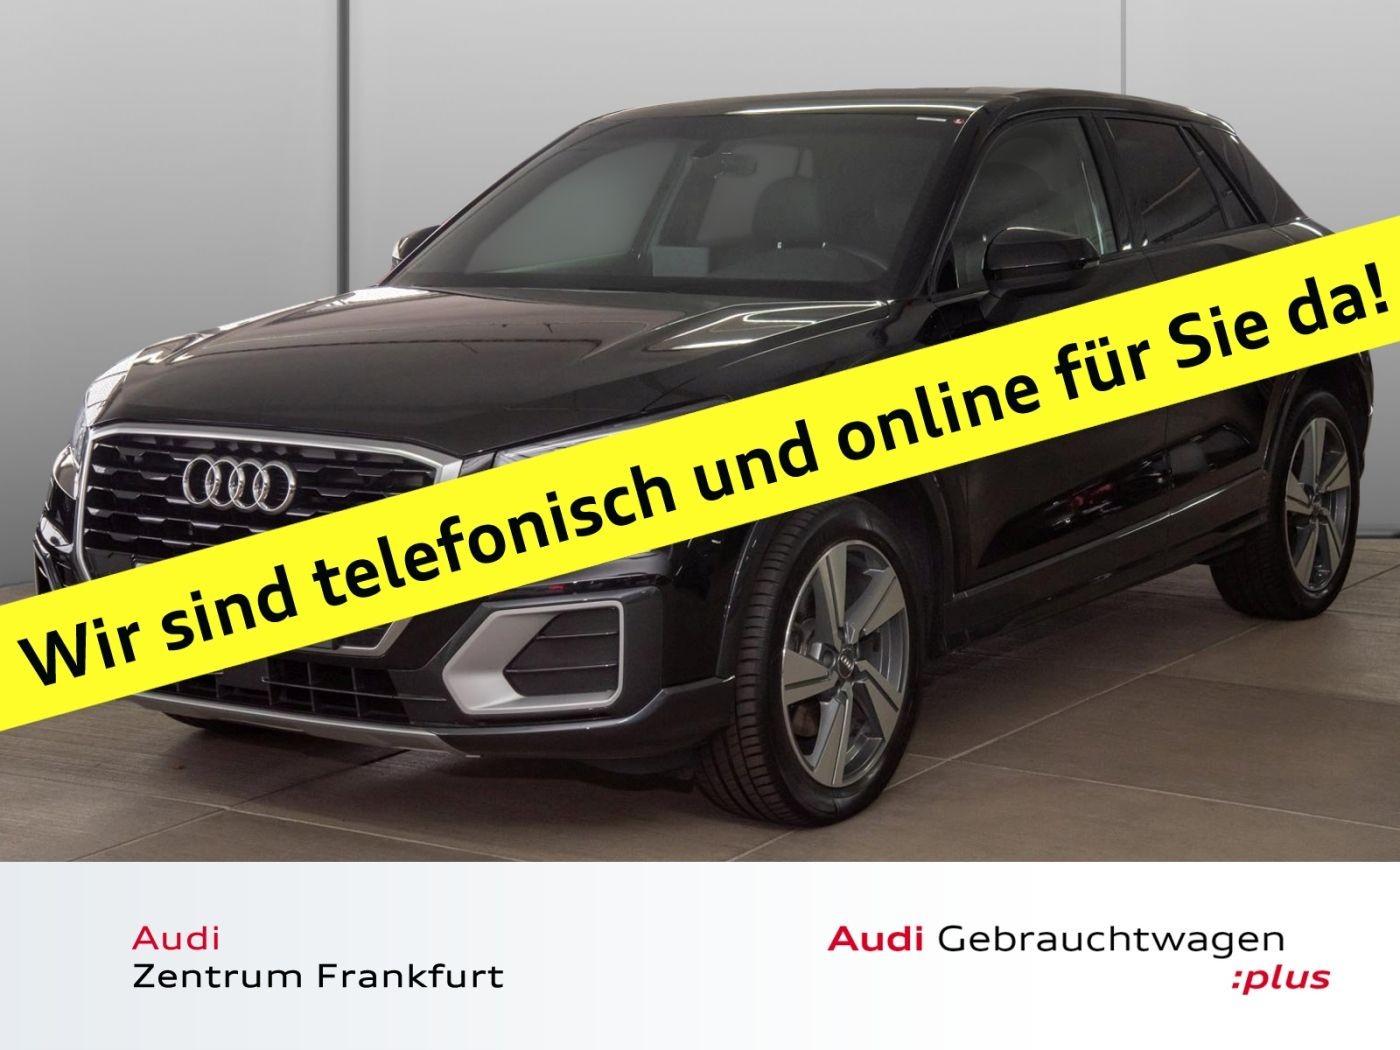 Audi Q2 1.0 TFSI ultra S tronic S line Bluetooth Navi PDC Temppomat, Jahr 2017, Benzin